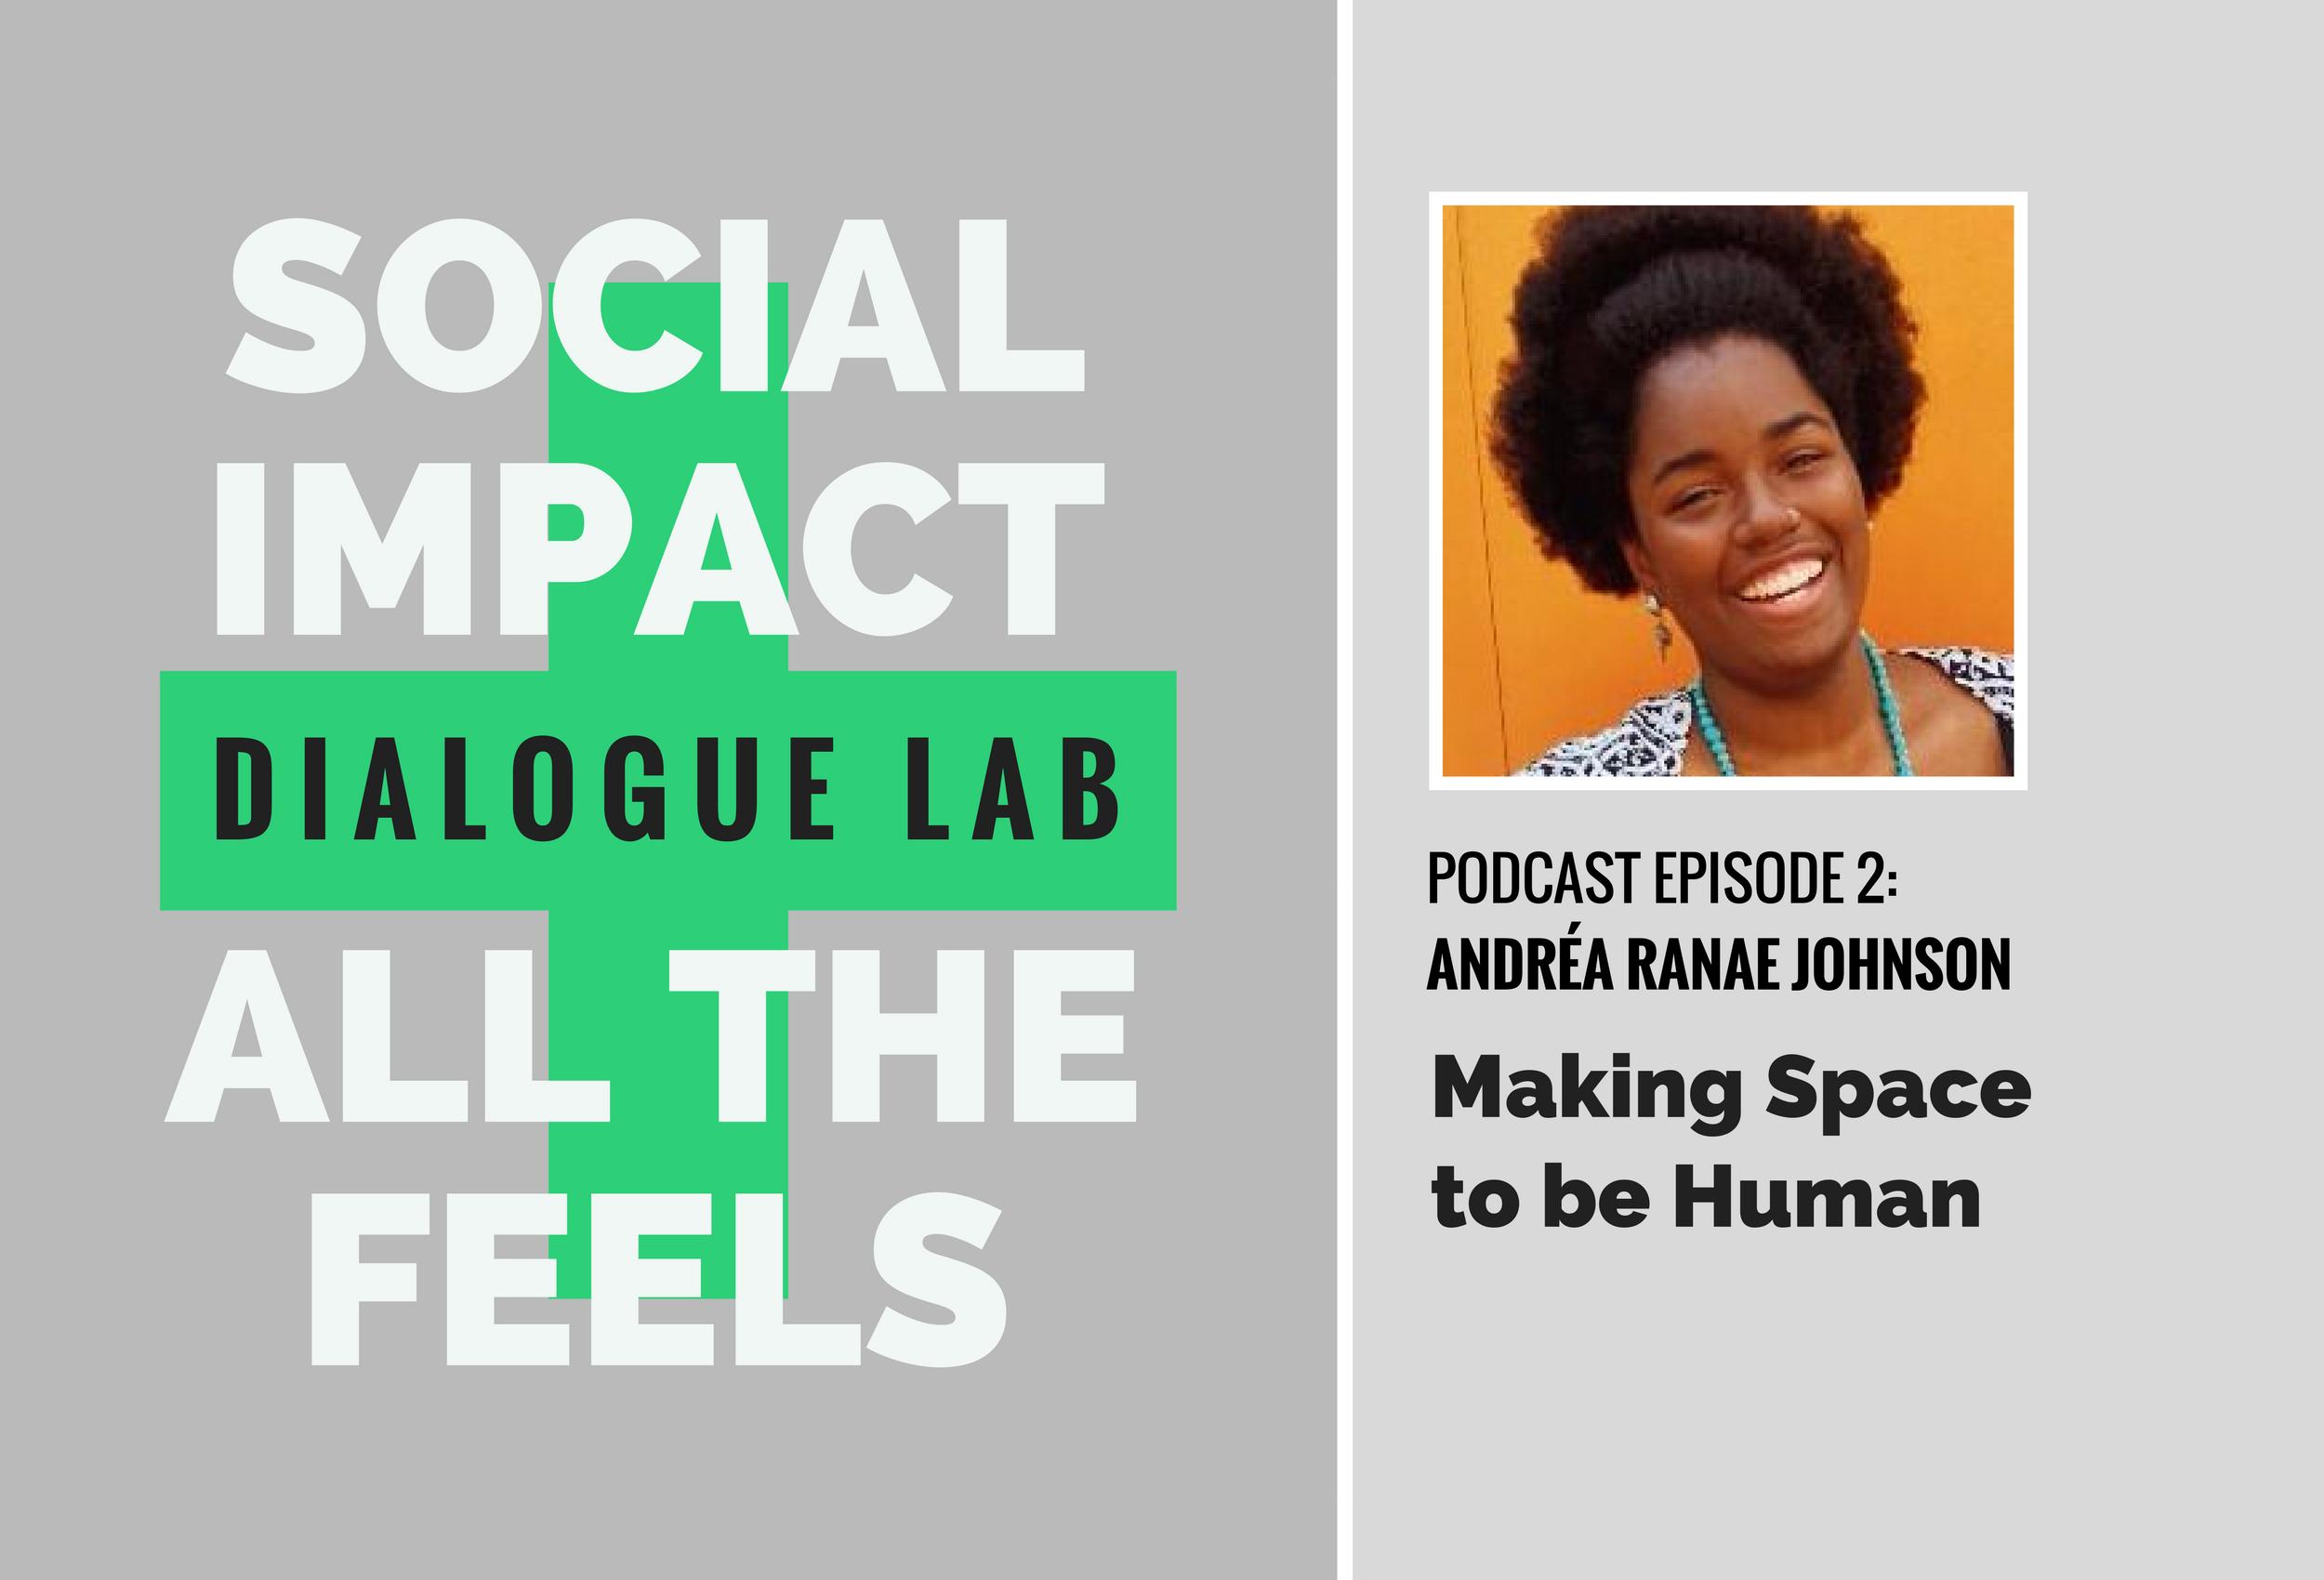 Episode 2 Art - Dialogue Lab Podcast.png